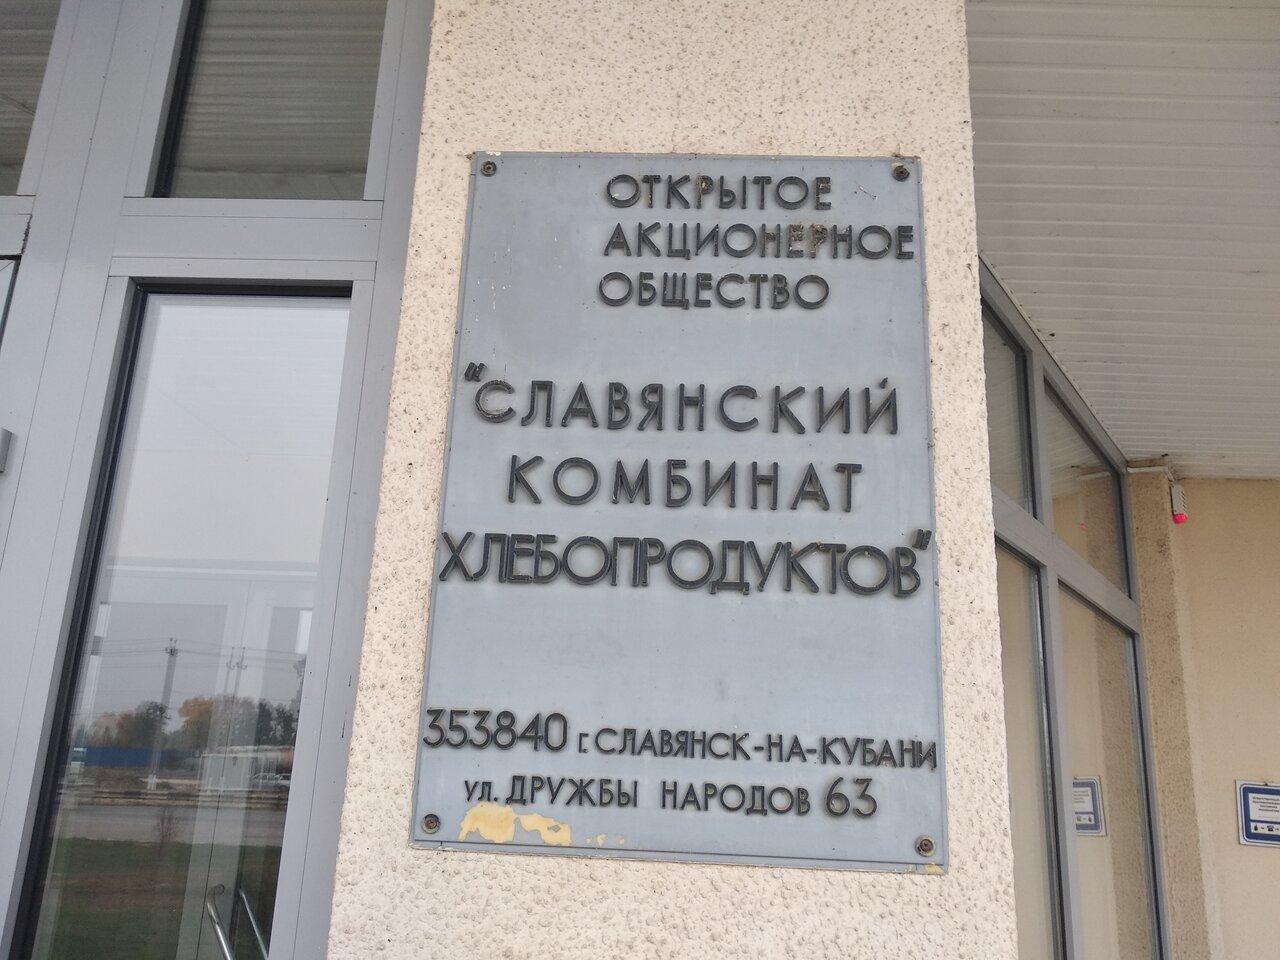 Элеватор славянск на кубани официальный сайт предохранители на т5 транспортер 2009